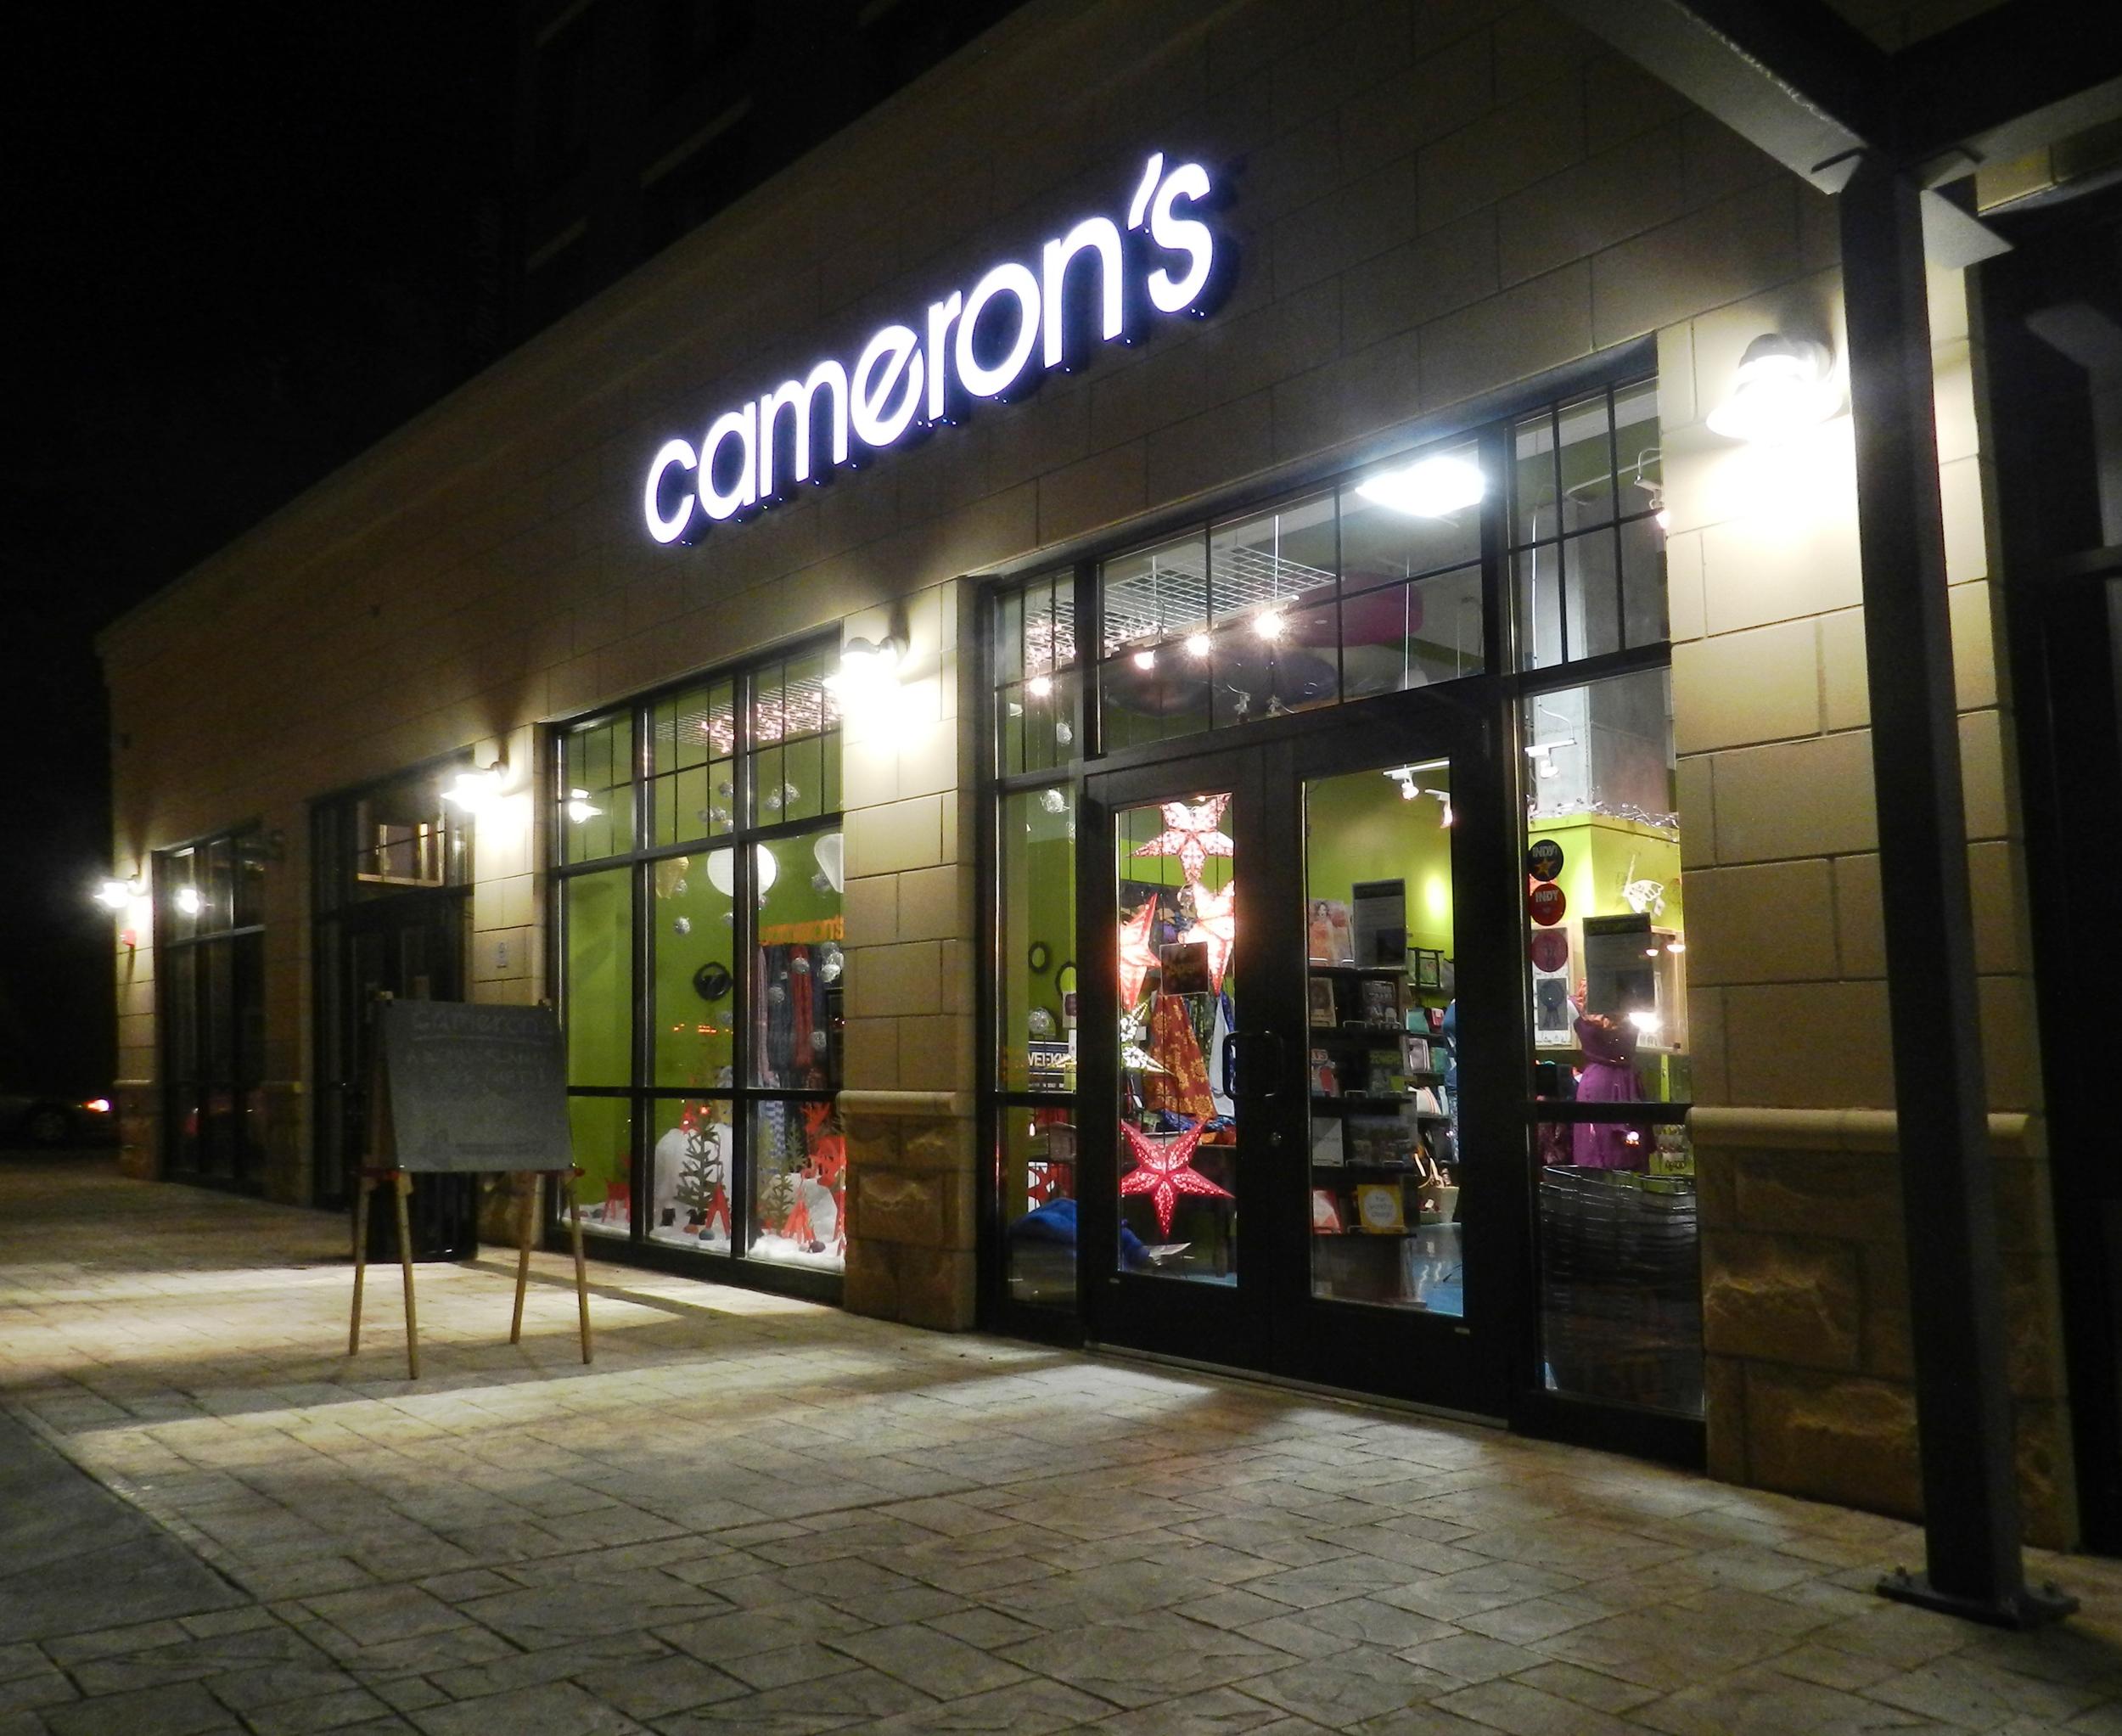 CAMERONS-2 cariedit.jpg